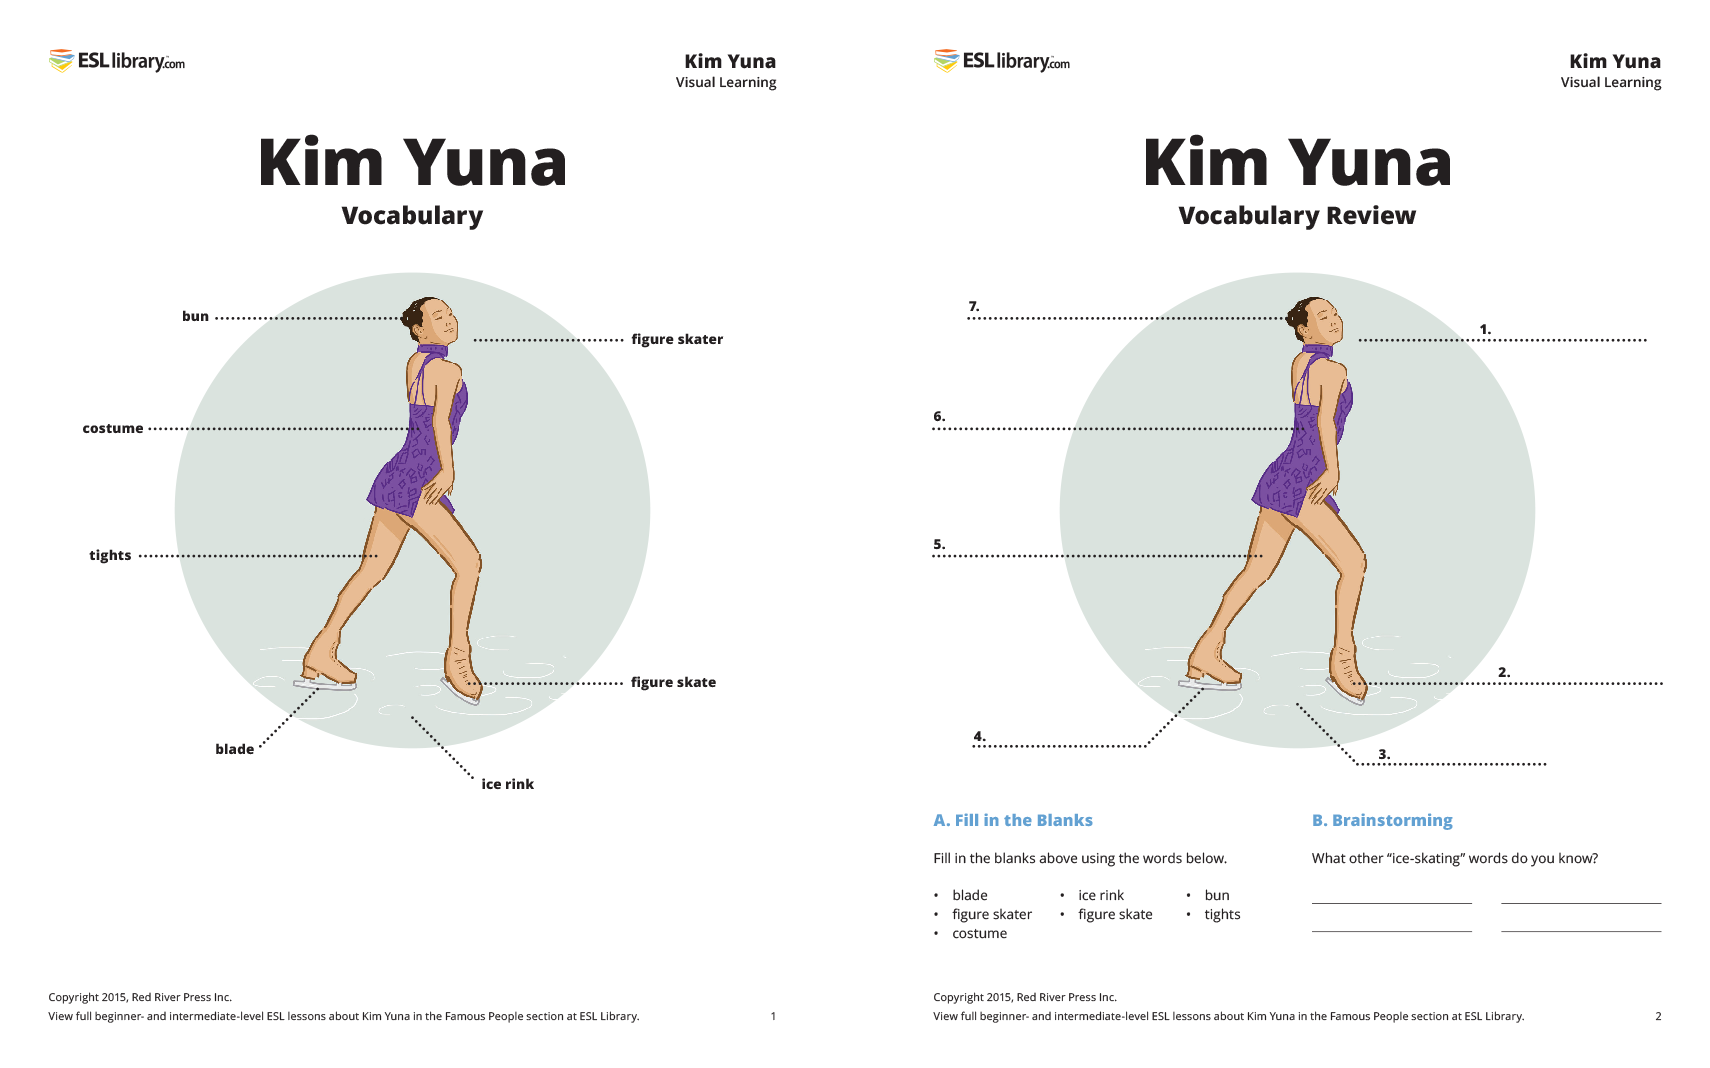 VL_Kim-Yuna